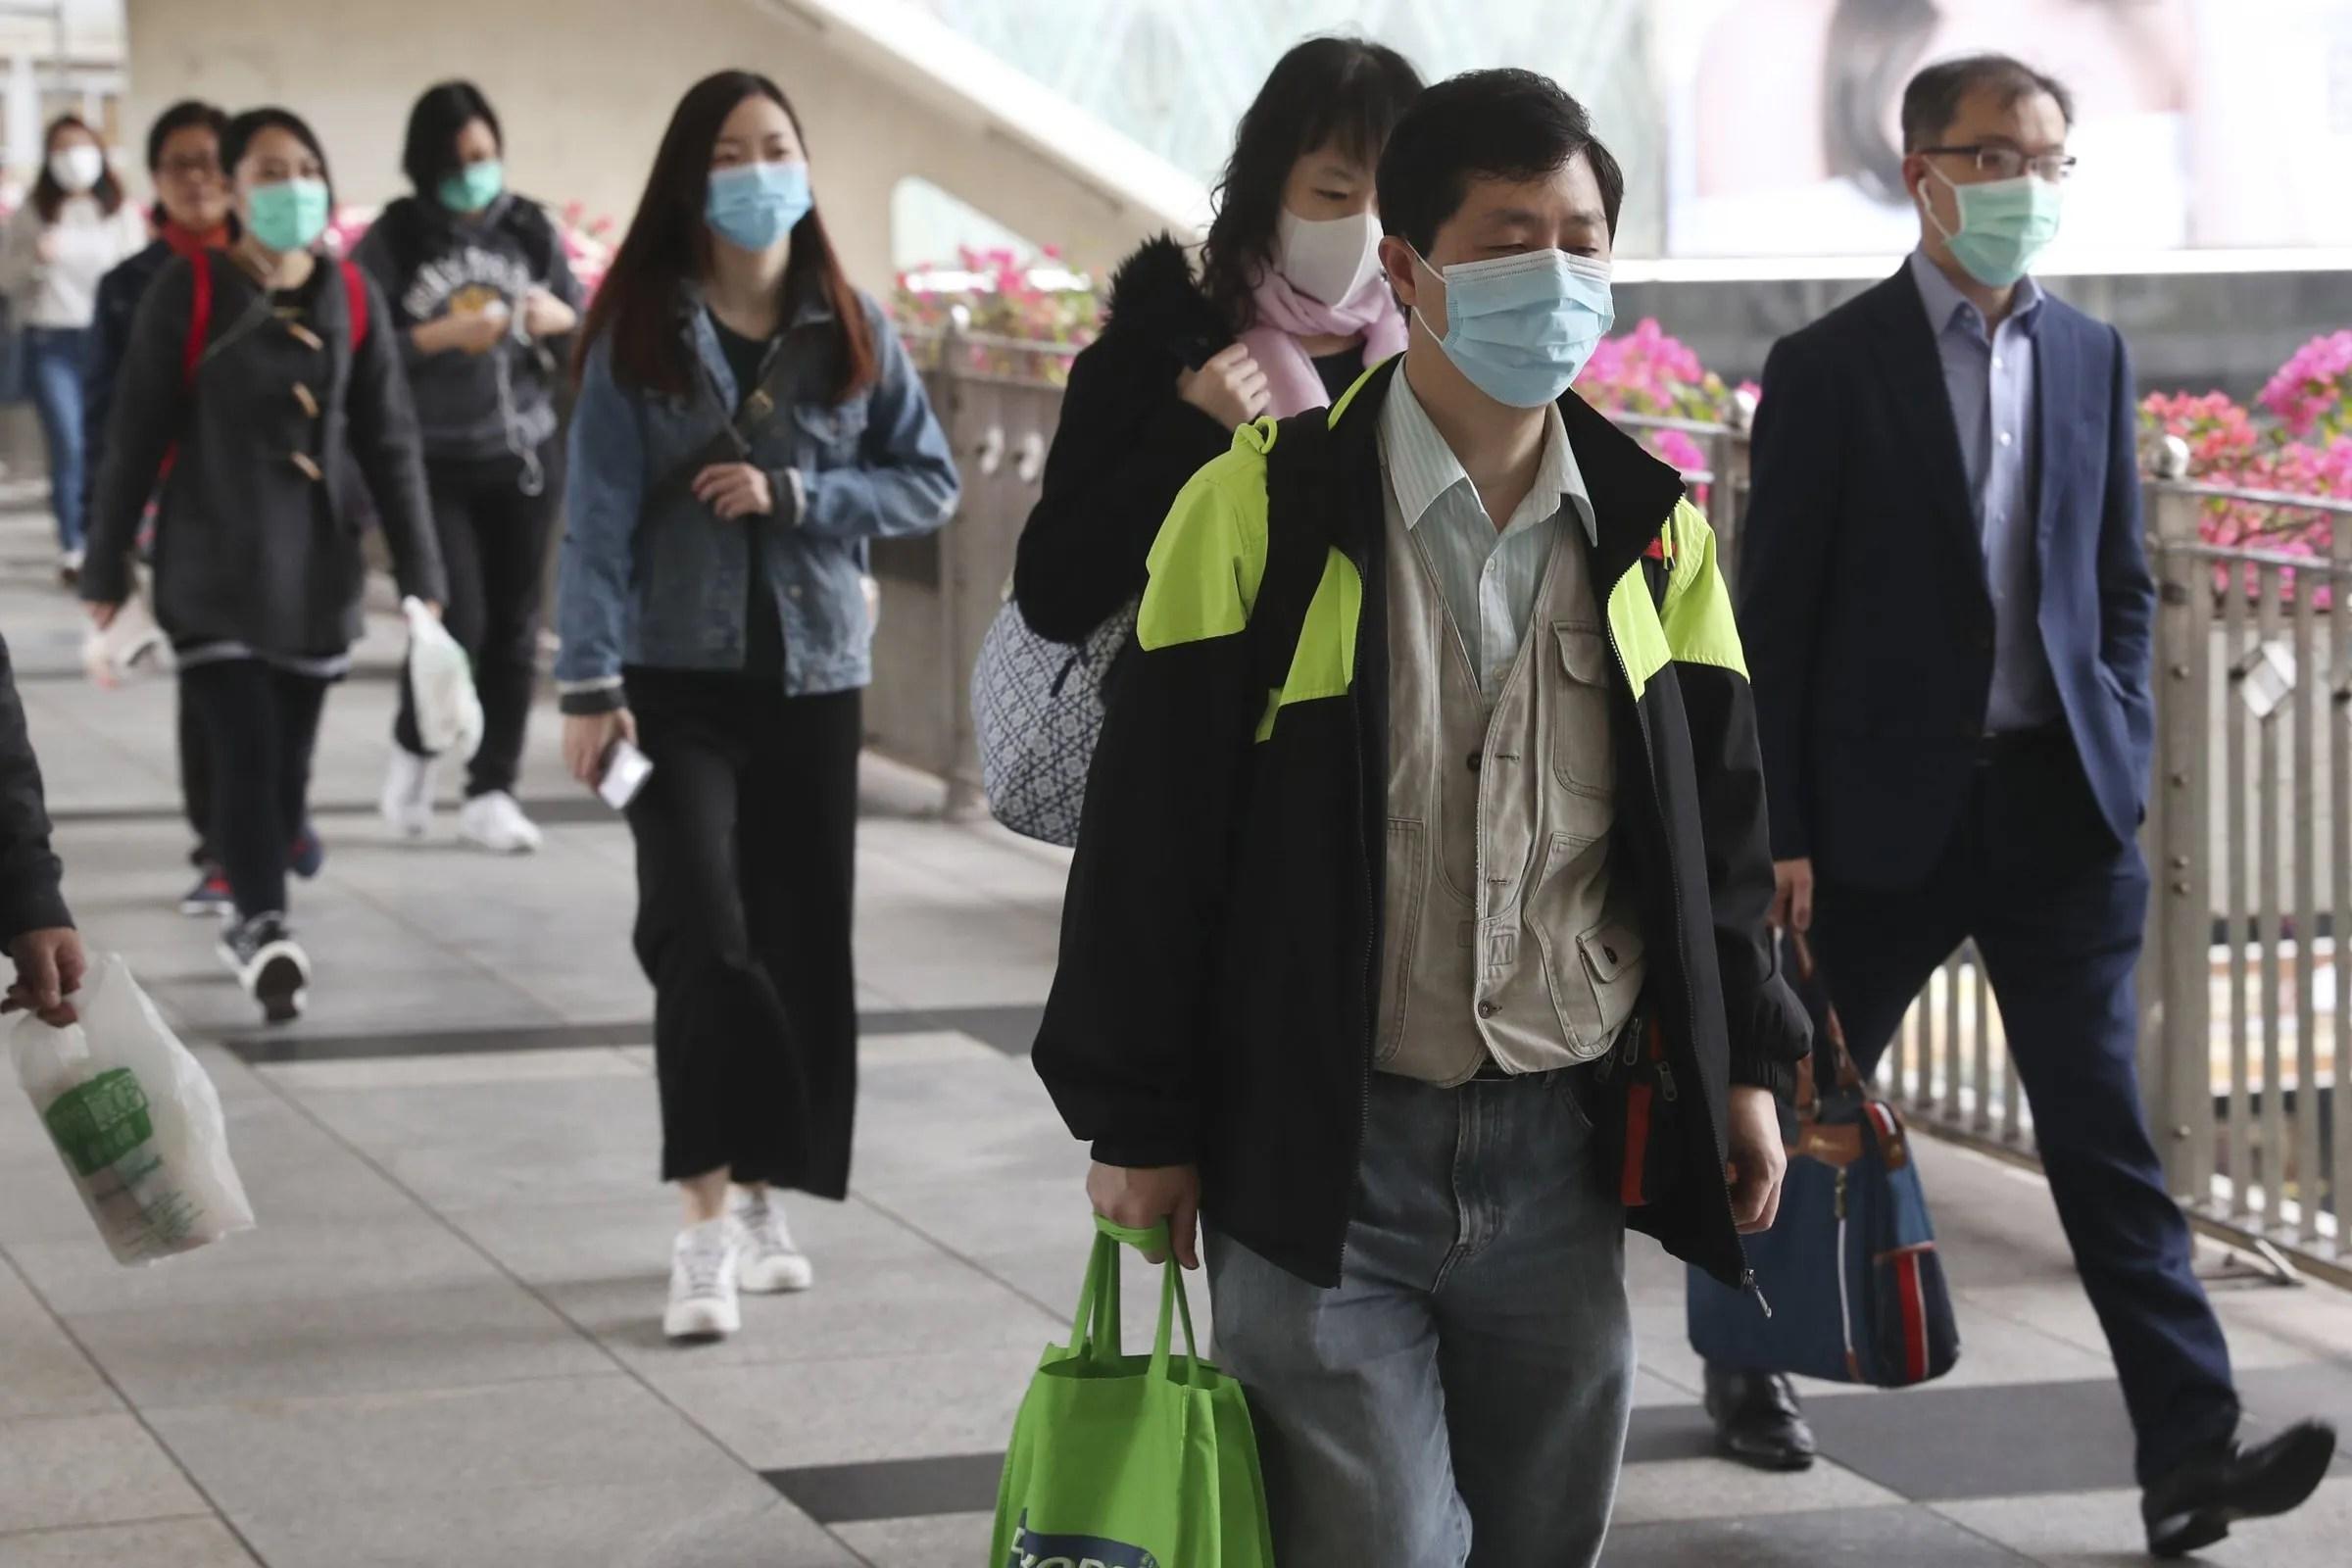 Q&A: Do face masks protect against coronavirus? Do I need one ...